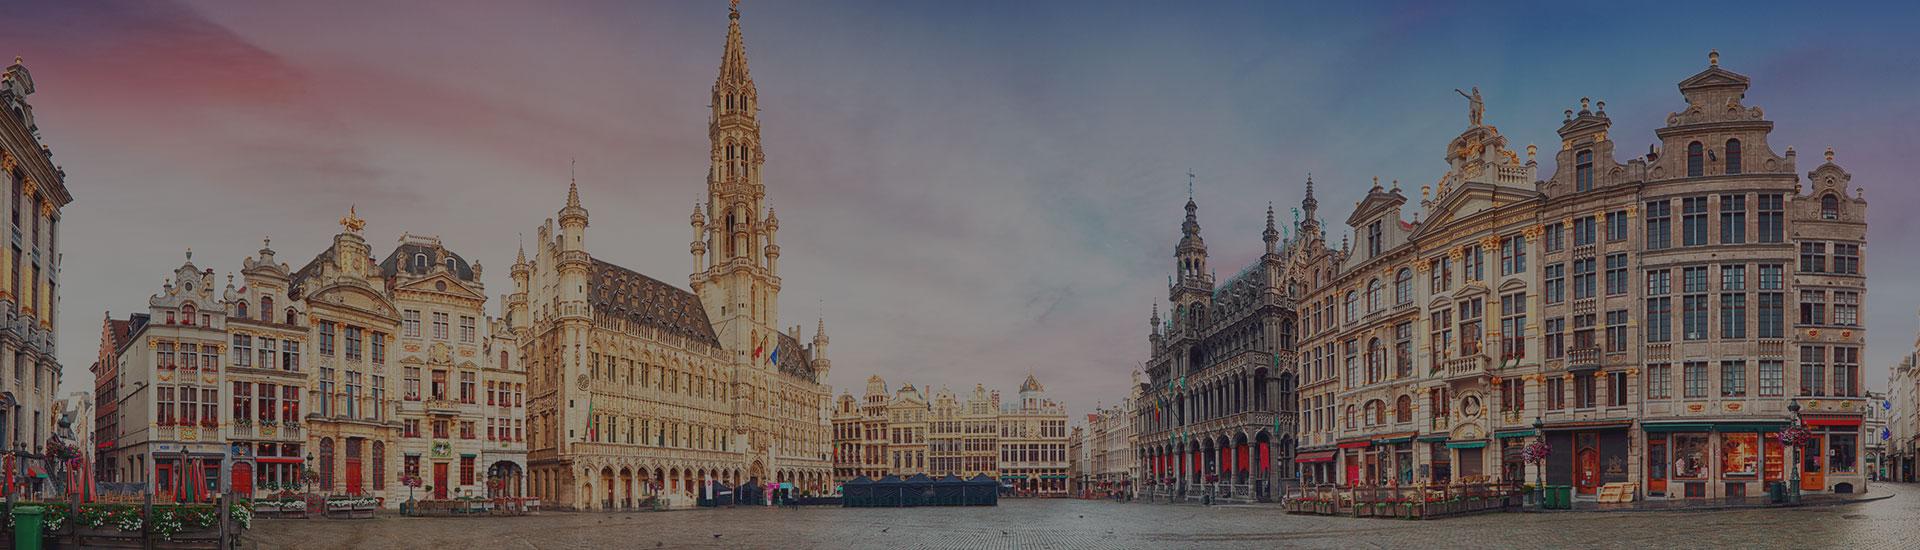 Spedition-Belgien-Logistikunternehmen